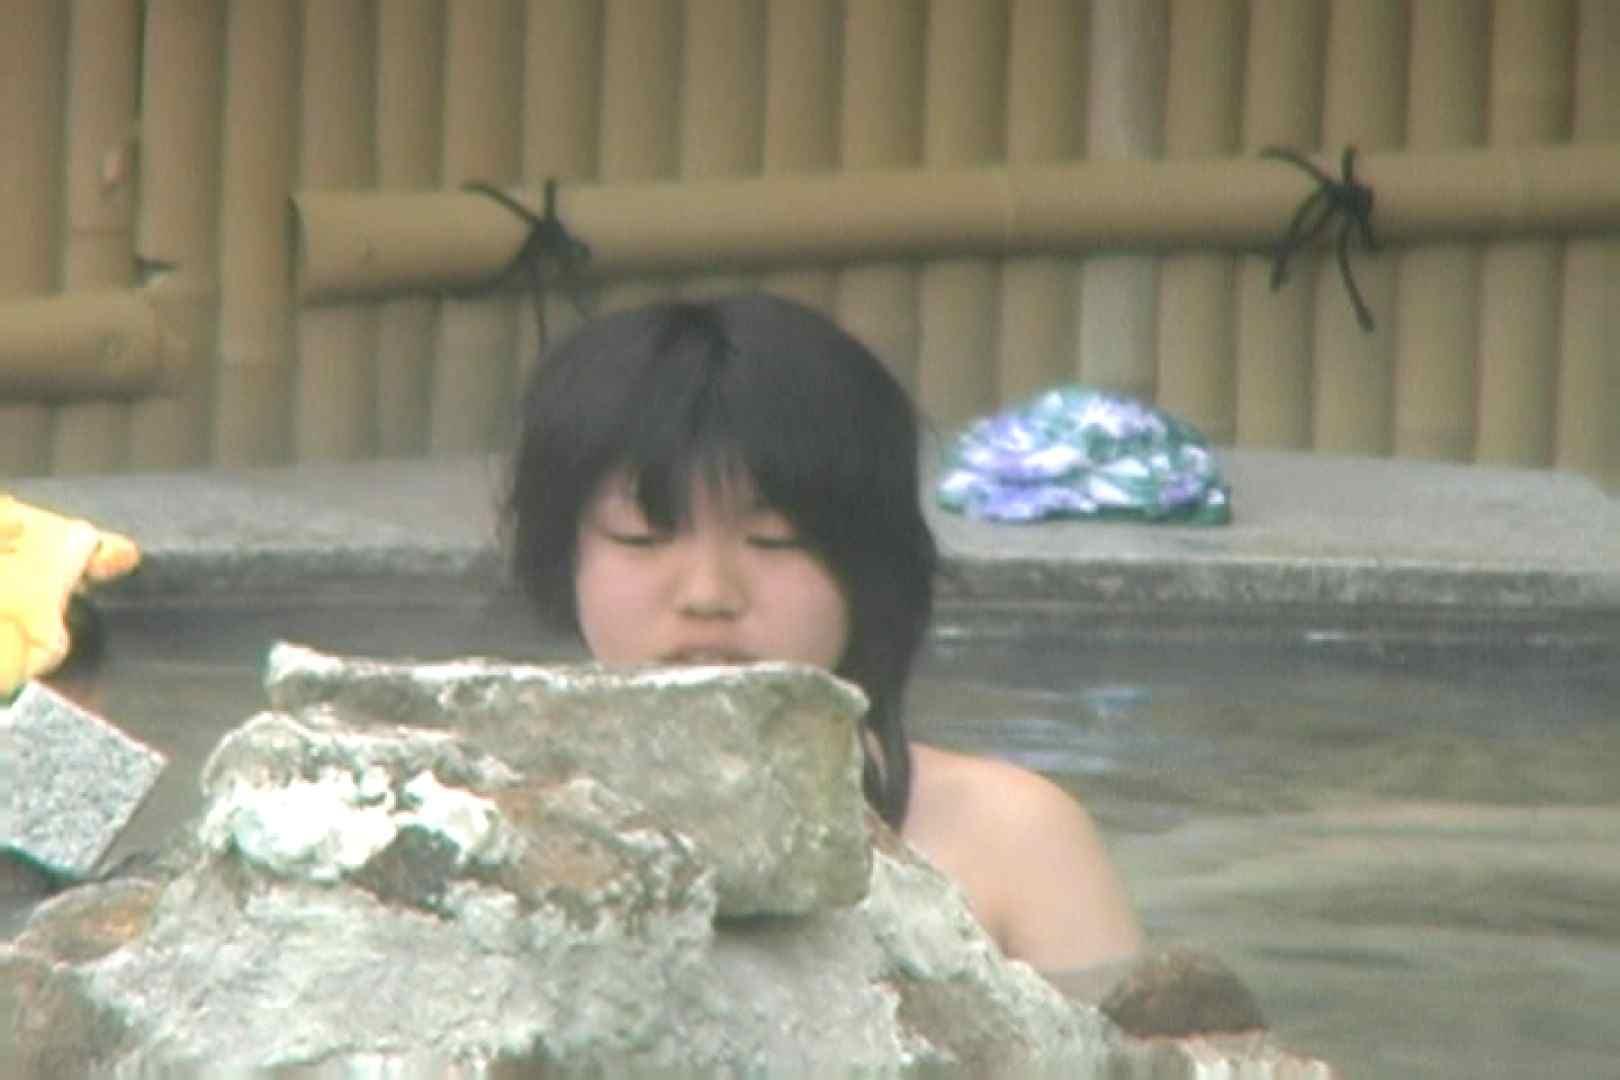 Aquaな露天風呂Vol.566 盗撮シリーズ | 露天風呂編  96PIX 43